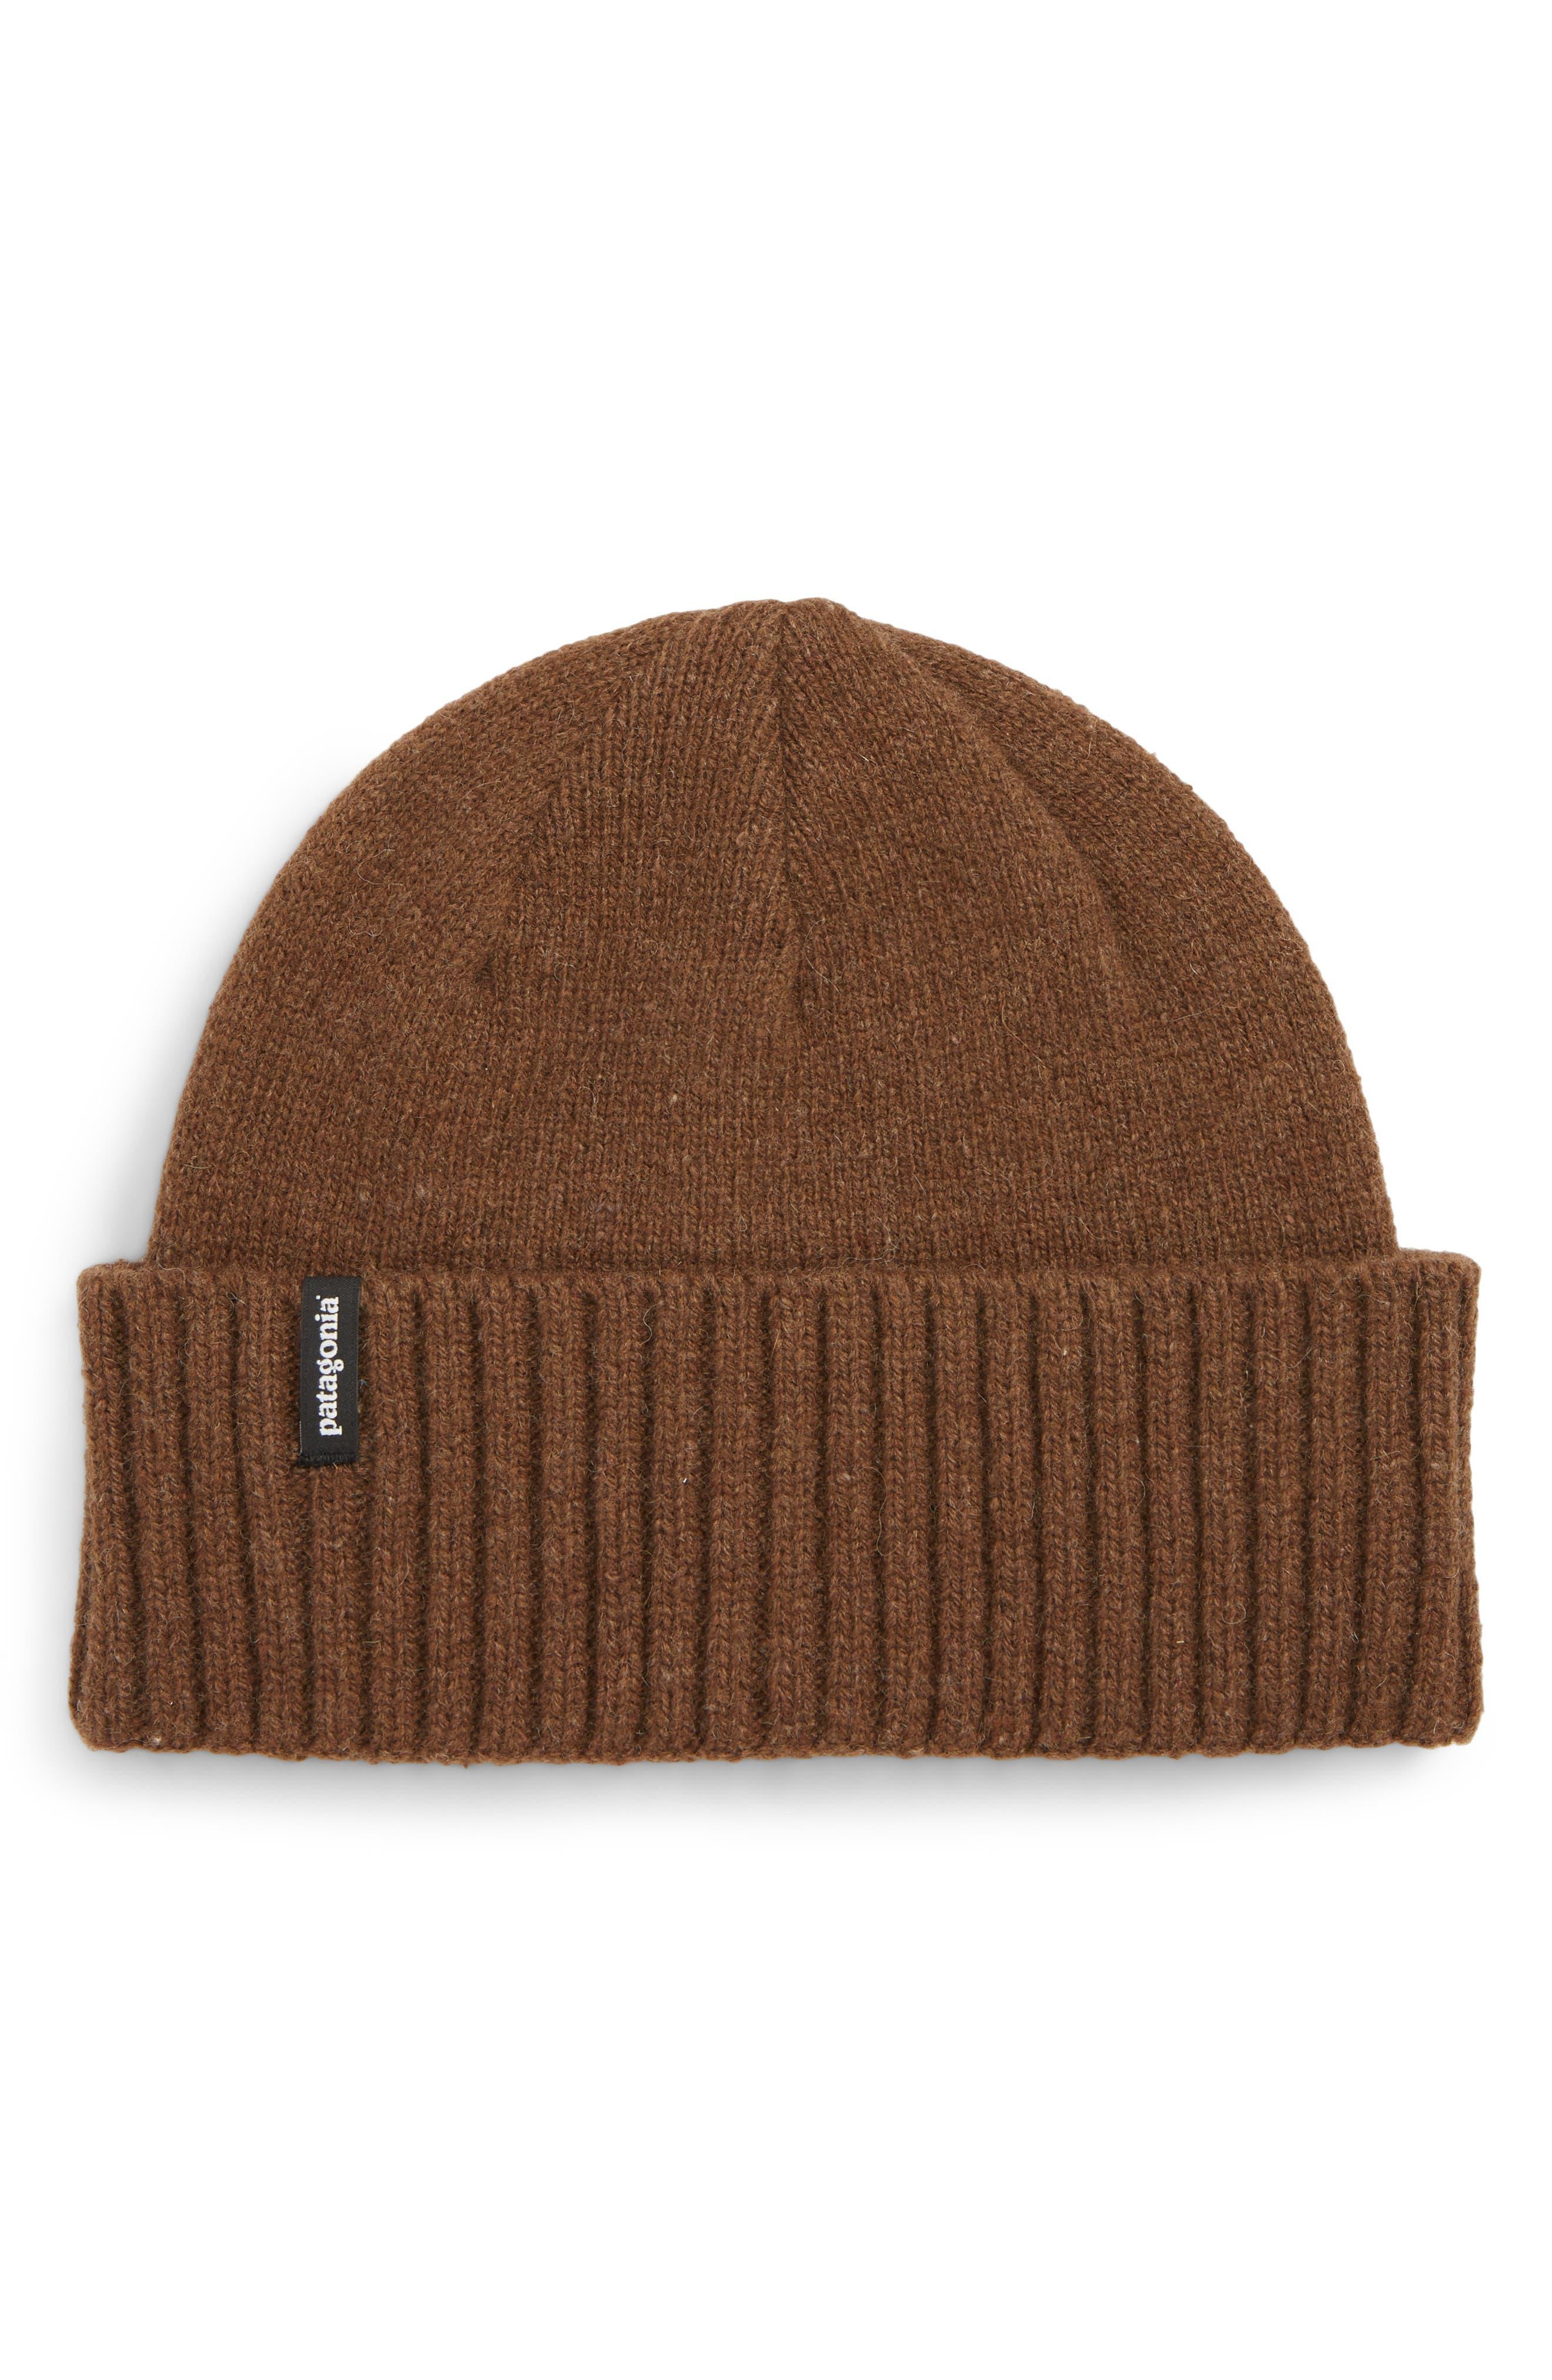 Brodeo Wool Stocking Cap,                         Main,                         color, TIMBER BROWN